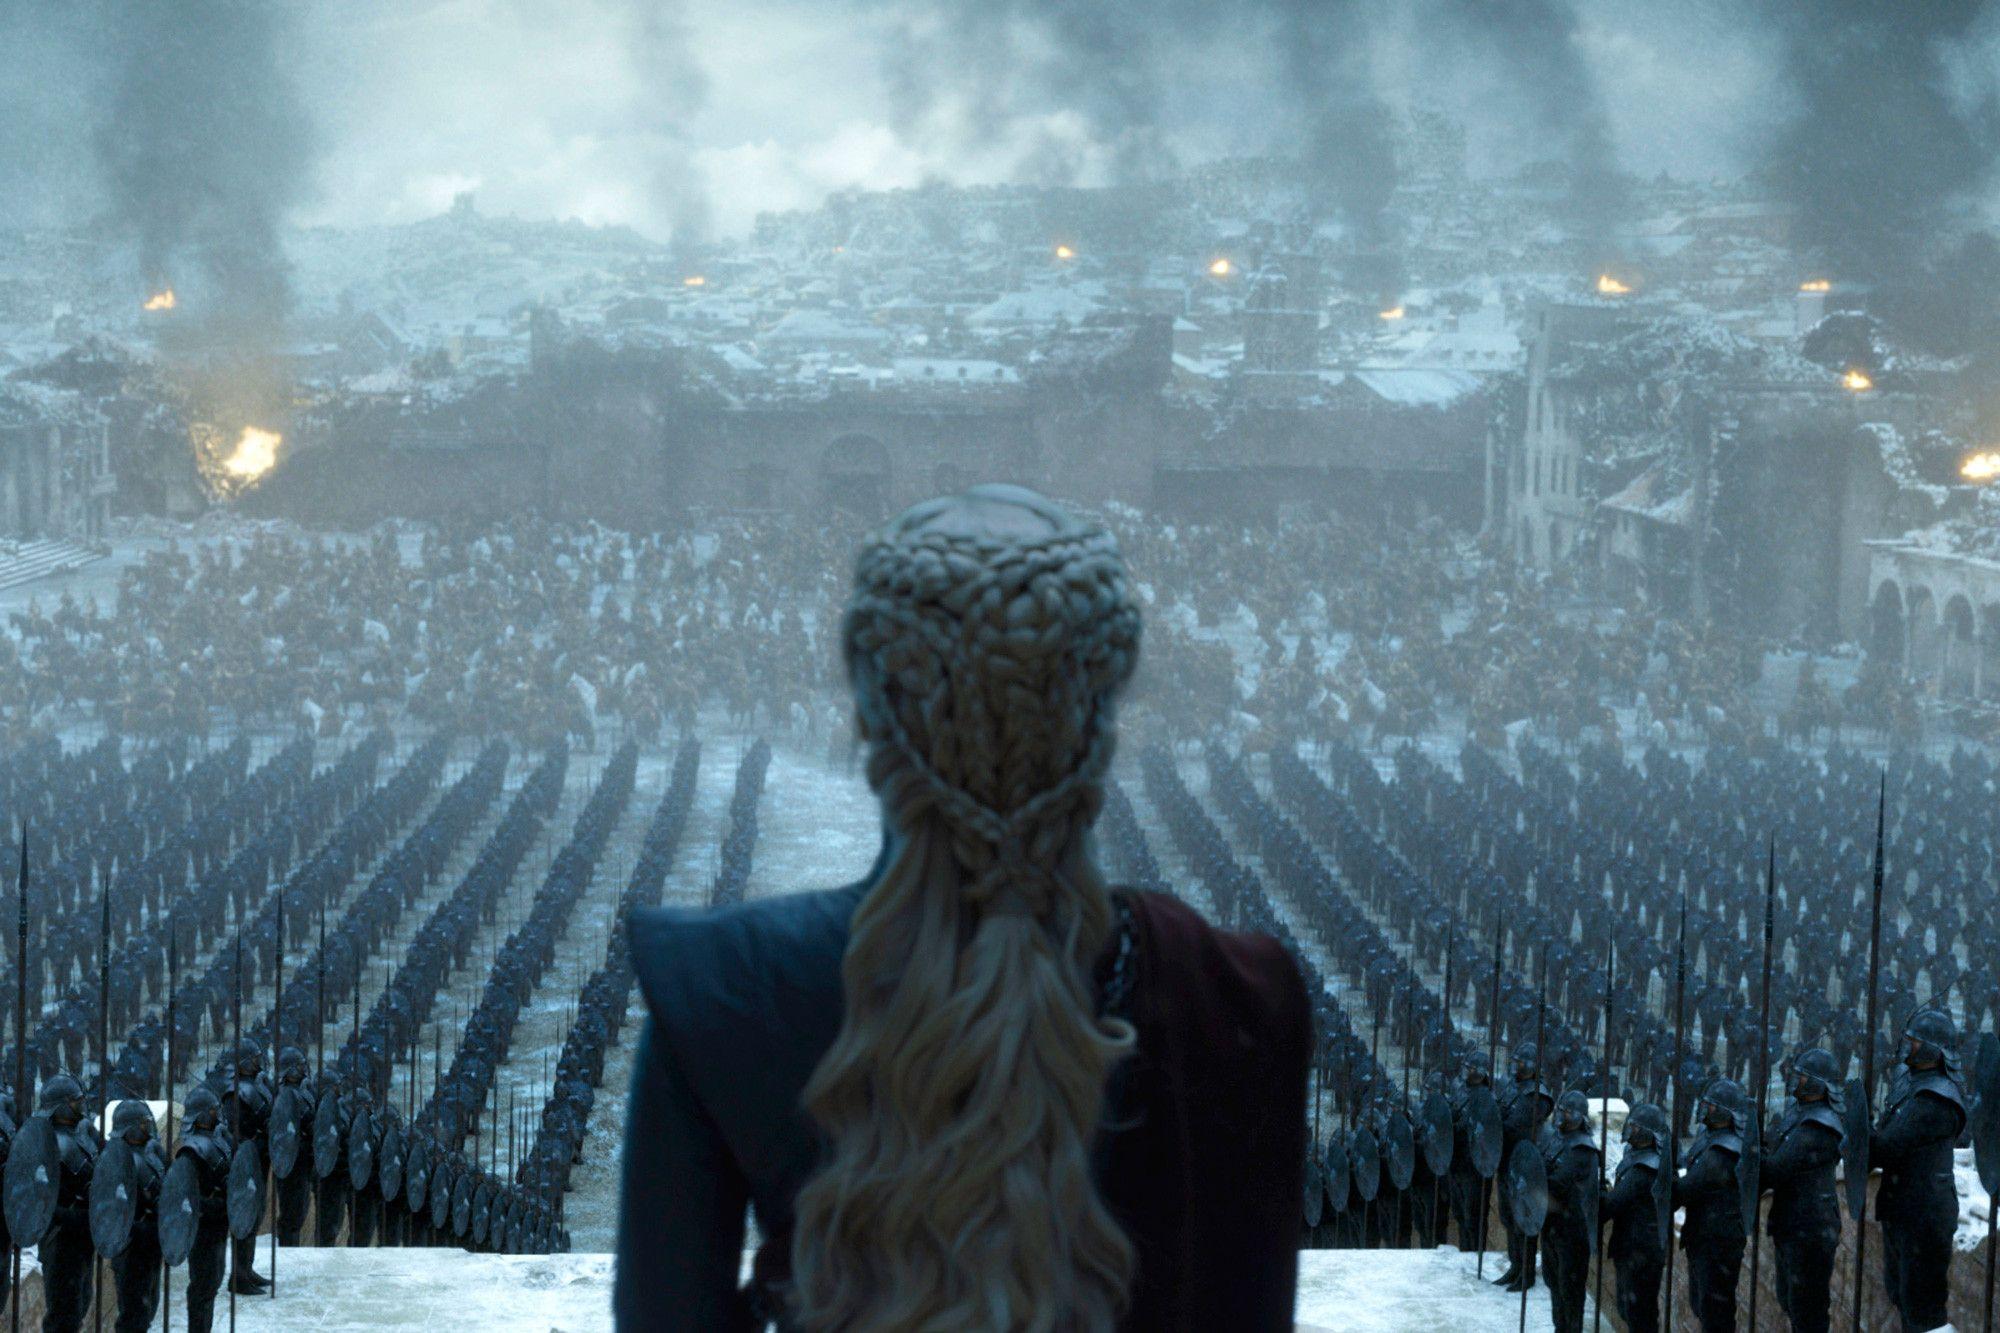 Emilia Clarke Drew Inspiration From Dictators Like Hitler For Daenerys' Big 'Game of Thrones' Speech